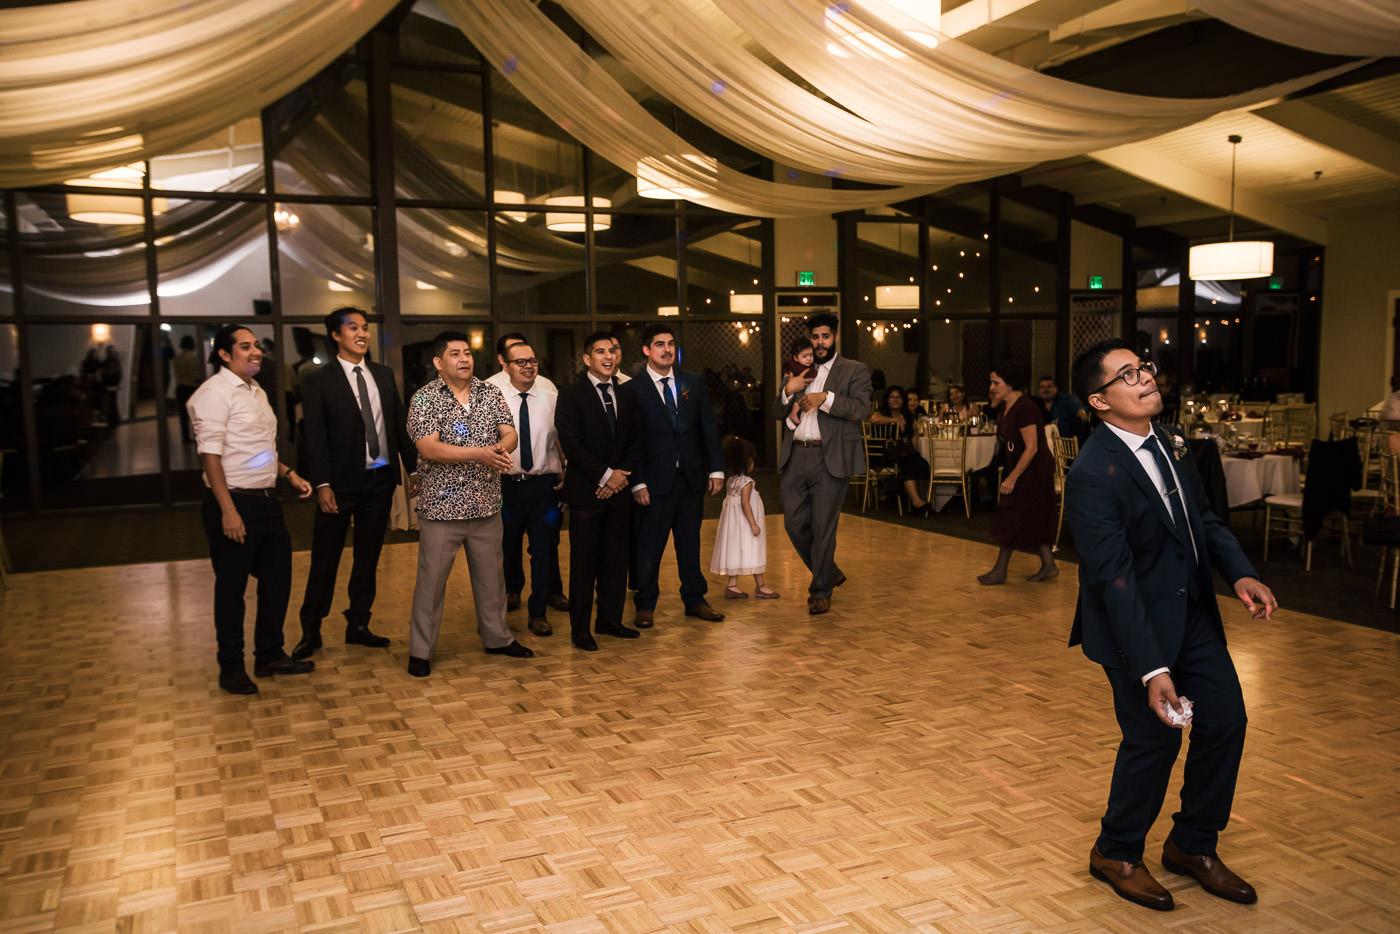 Groom prepares to throw the garter at wedding reception.